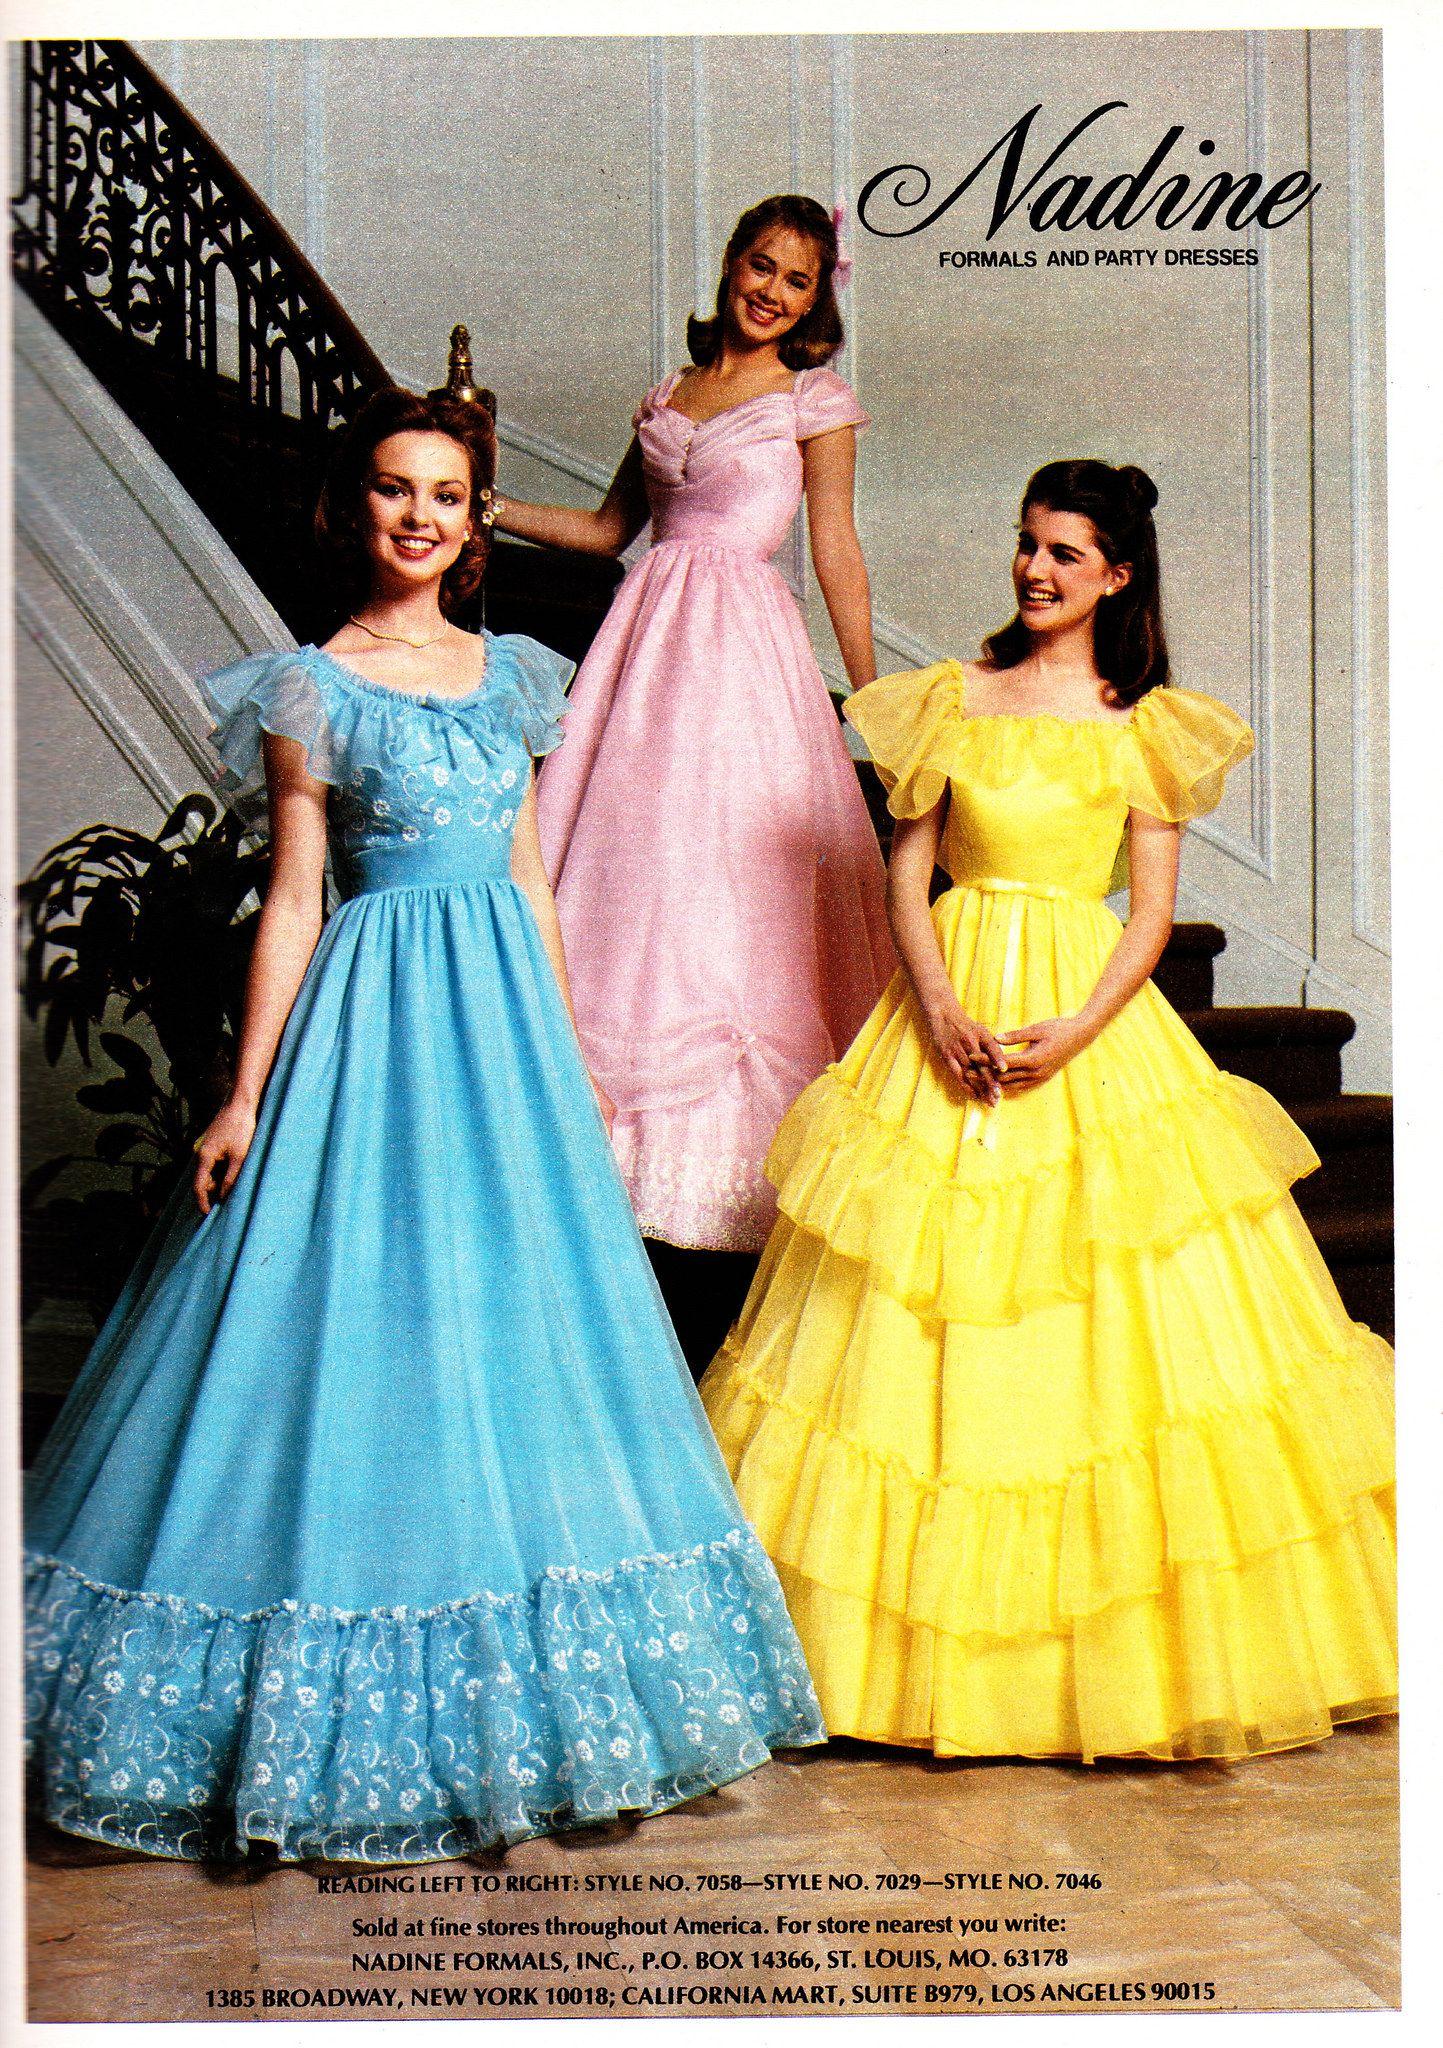 Nadine 1980 Prom Dresses Vintage 80s Prom Dress 80s Dresses [ 2048 x 1443 Pixel ]